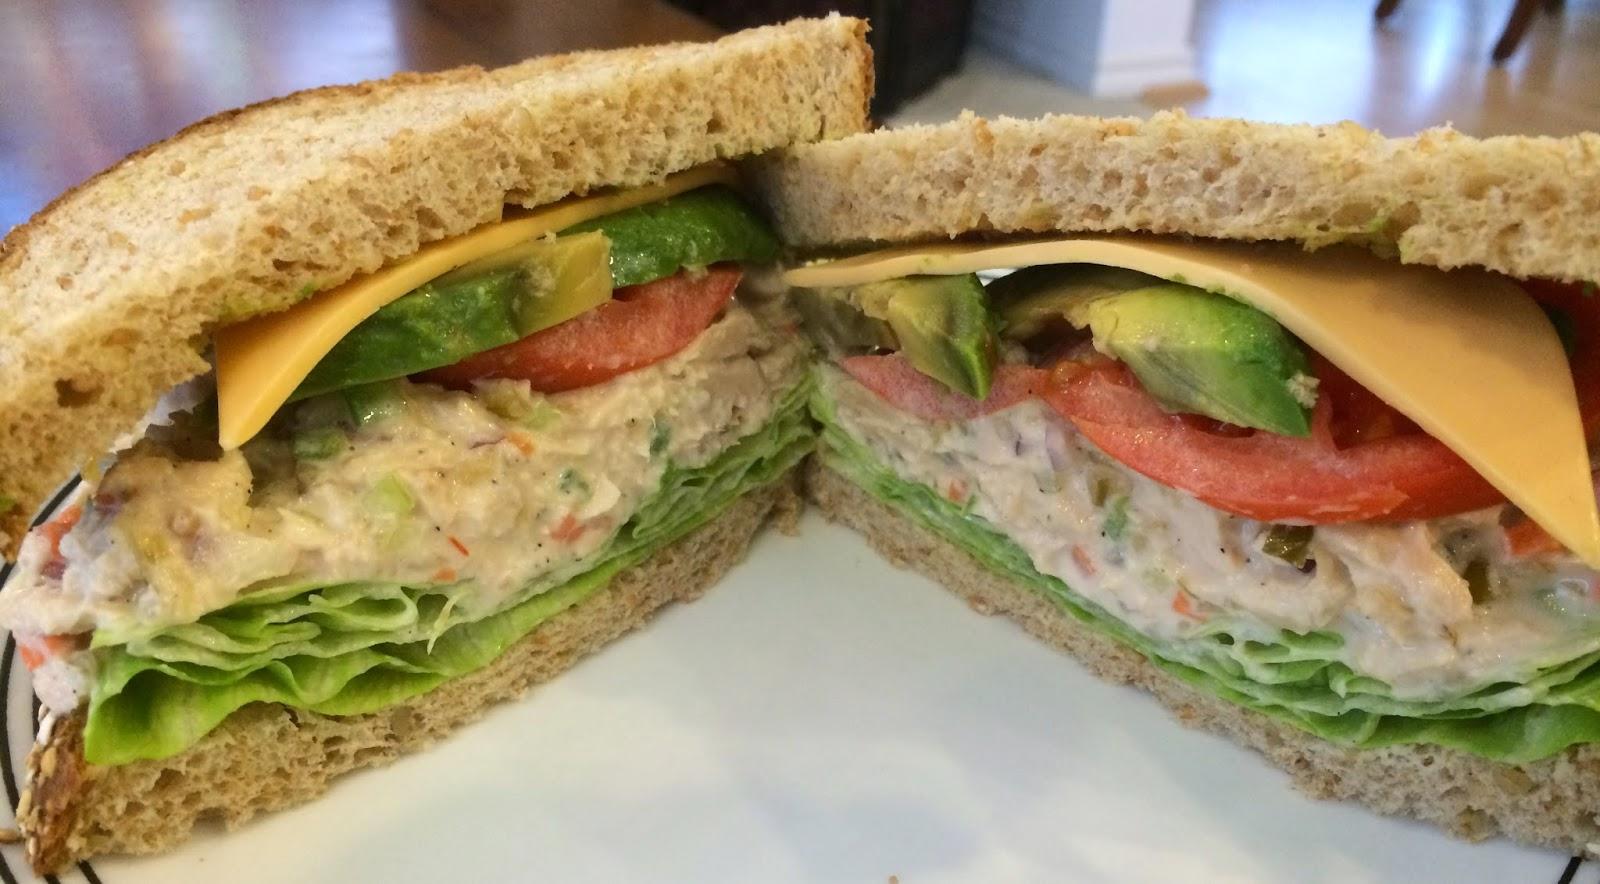 TASTE OF HAWAII: WORLD'S BEST TUNA SANDWICH RECIPE